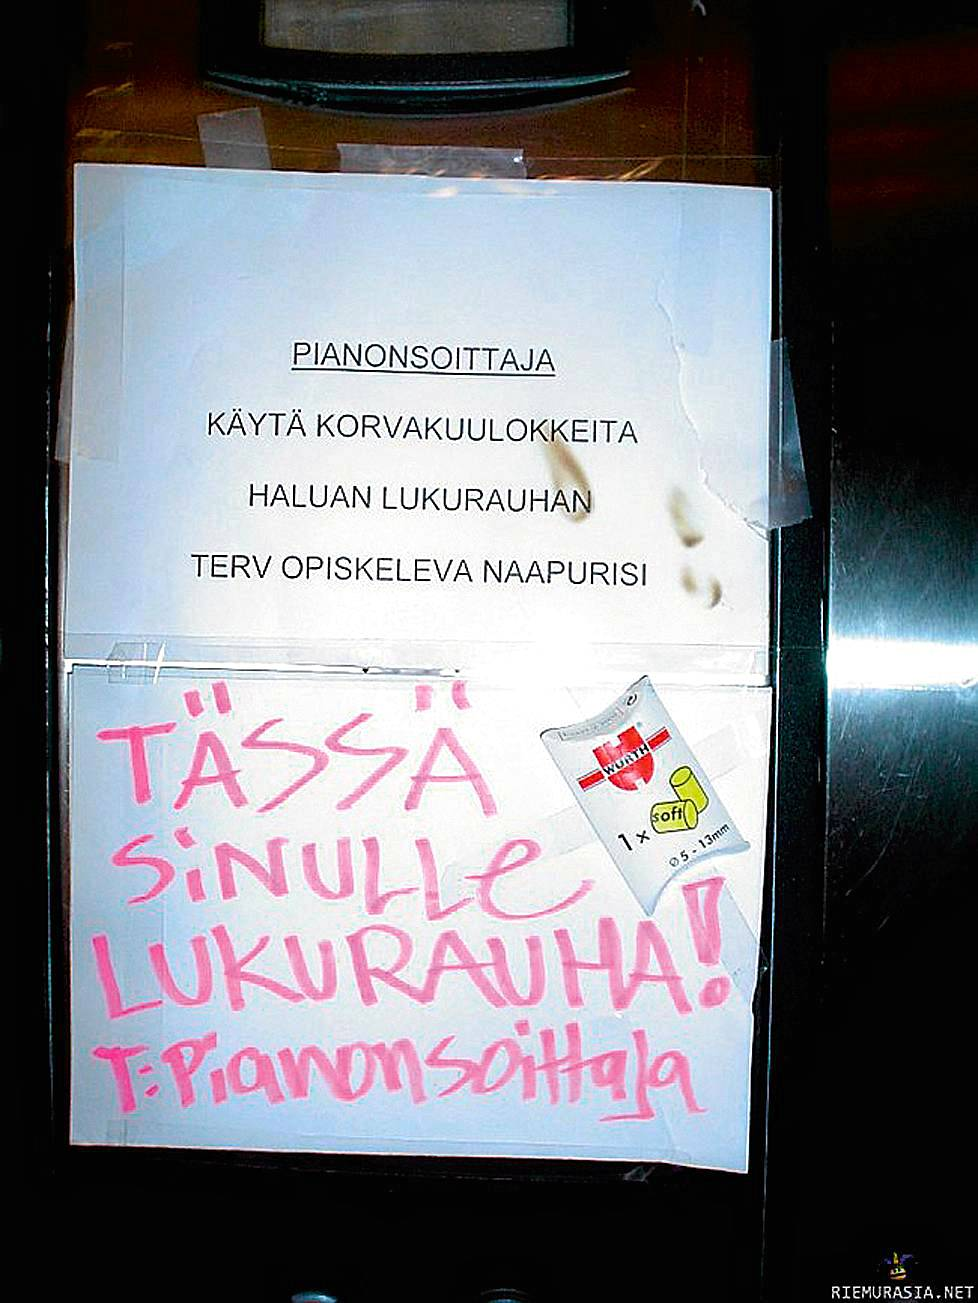 Quot T 228 Ll 228 Kupongilla 10 Lis 228 Maksu Kebab Annoksista Quot Kirja